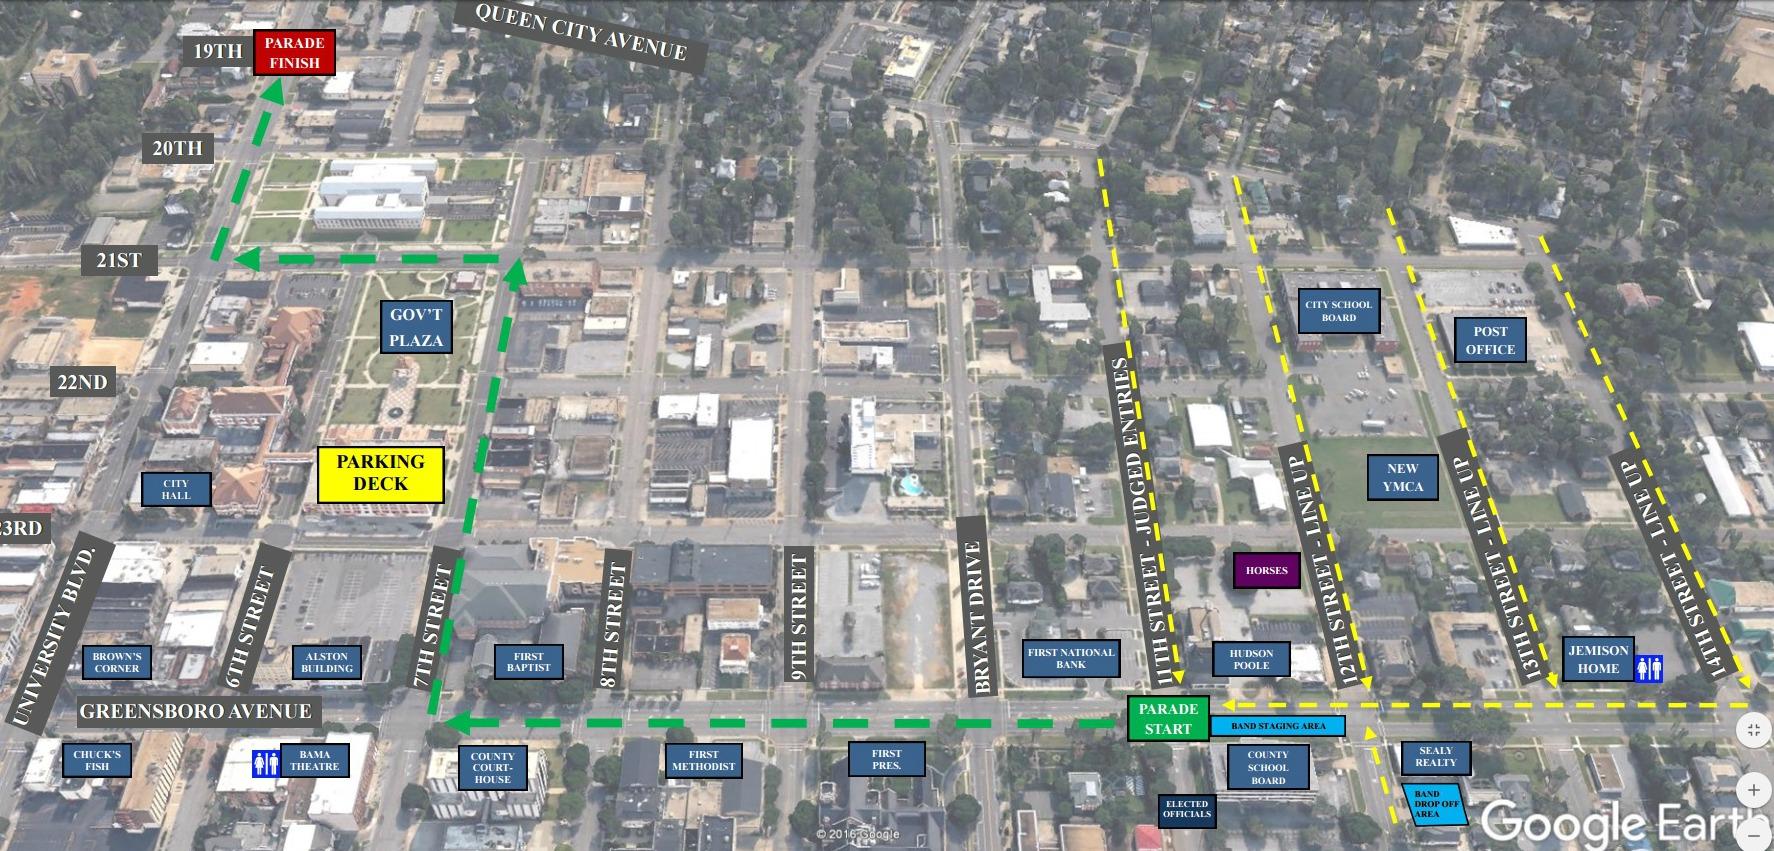 West Alabama Christmas Parade Announces New Route for 2016 [MAP